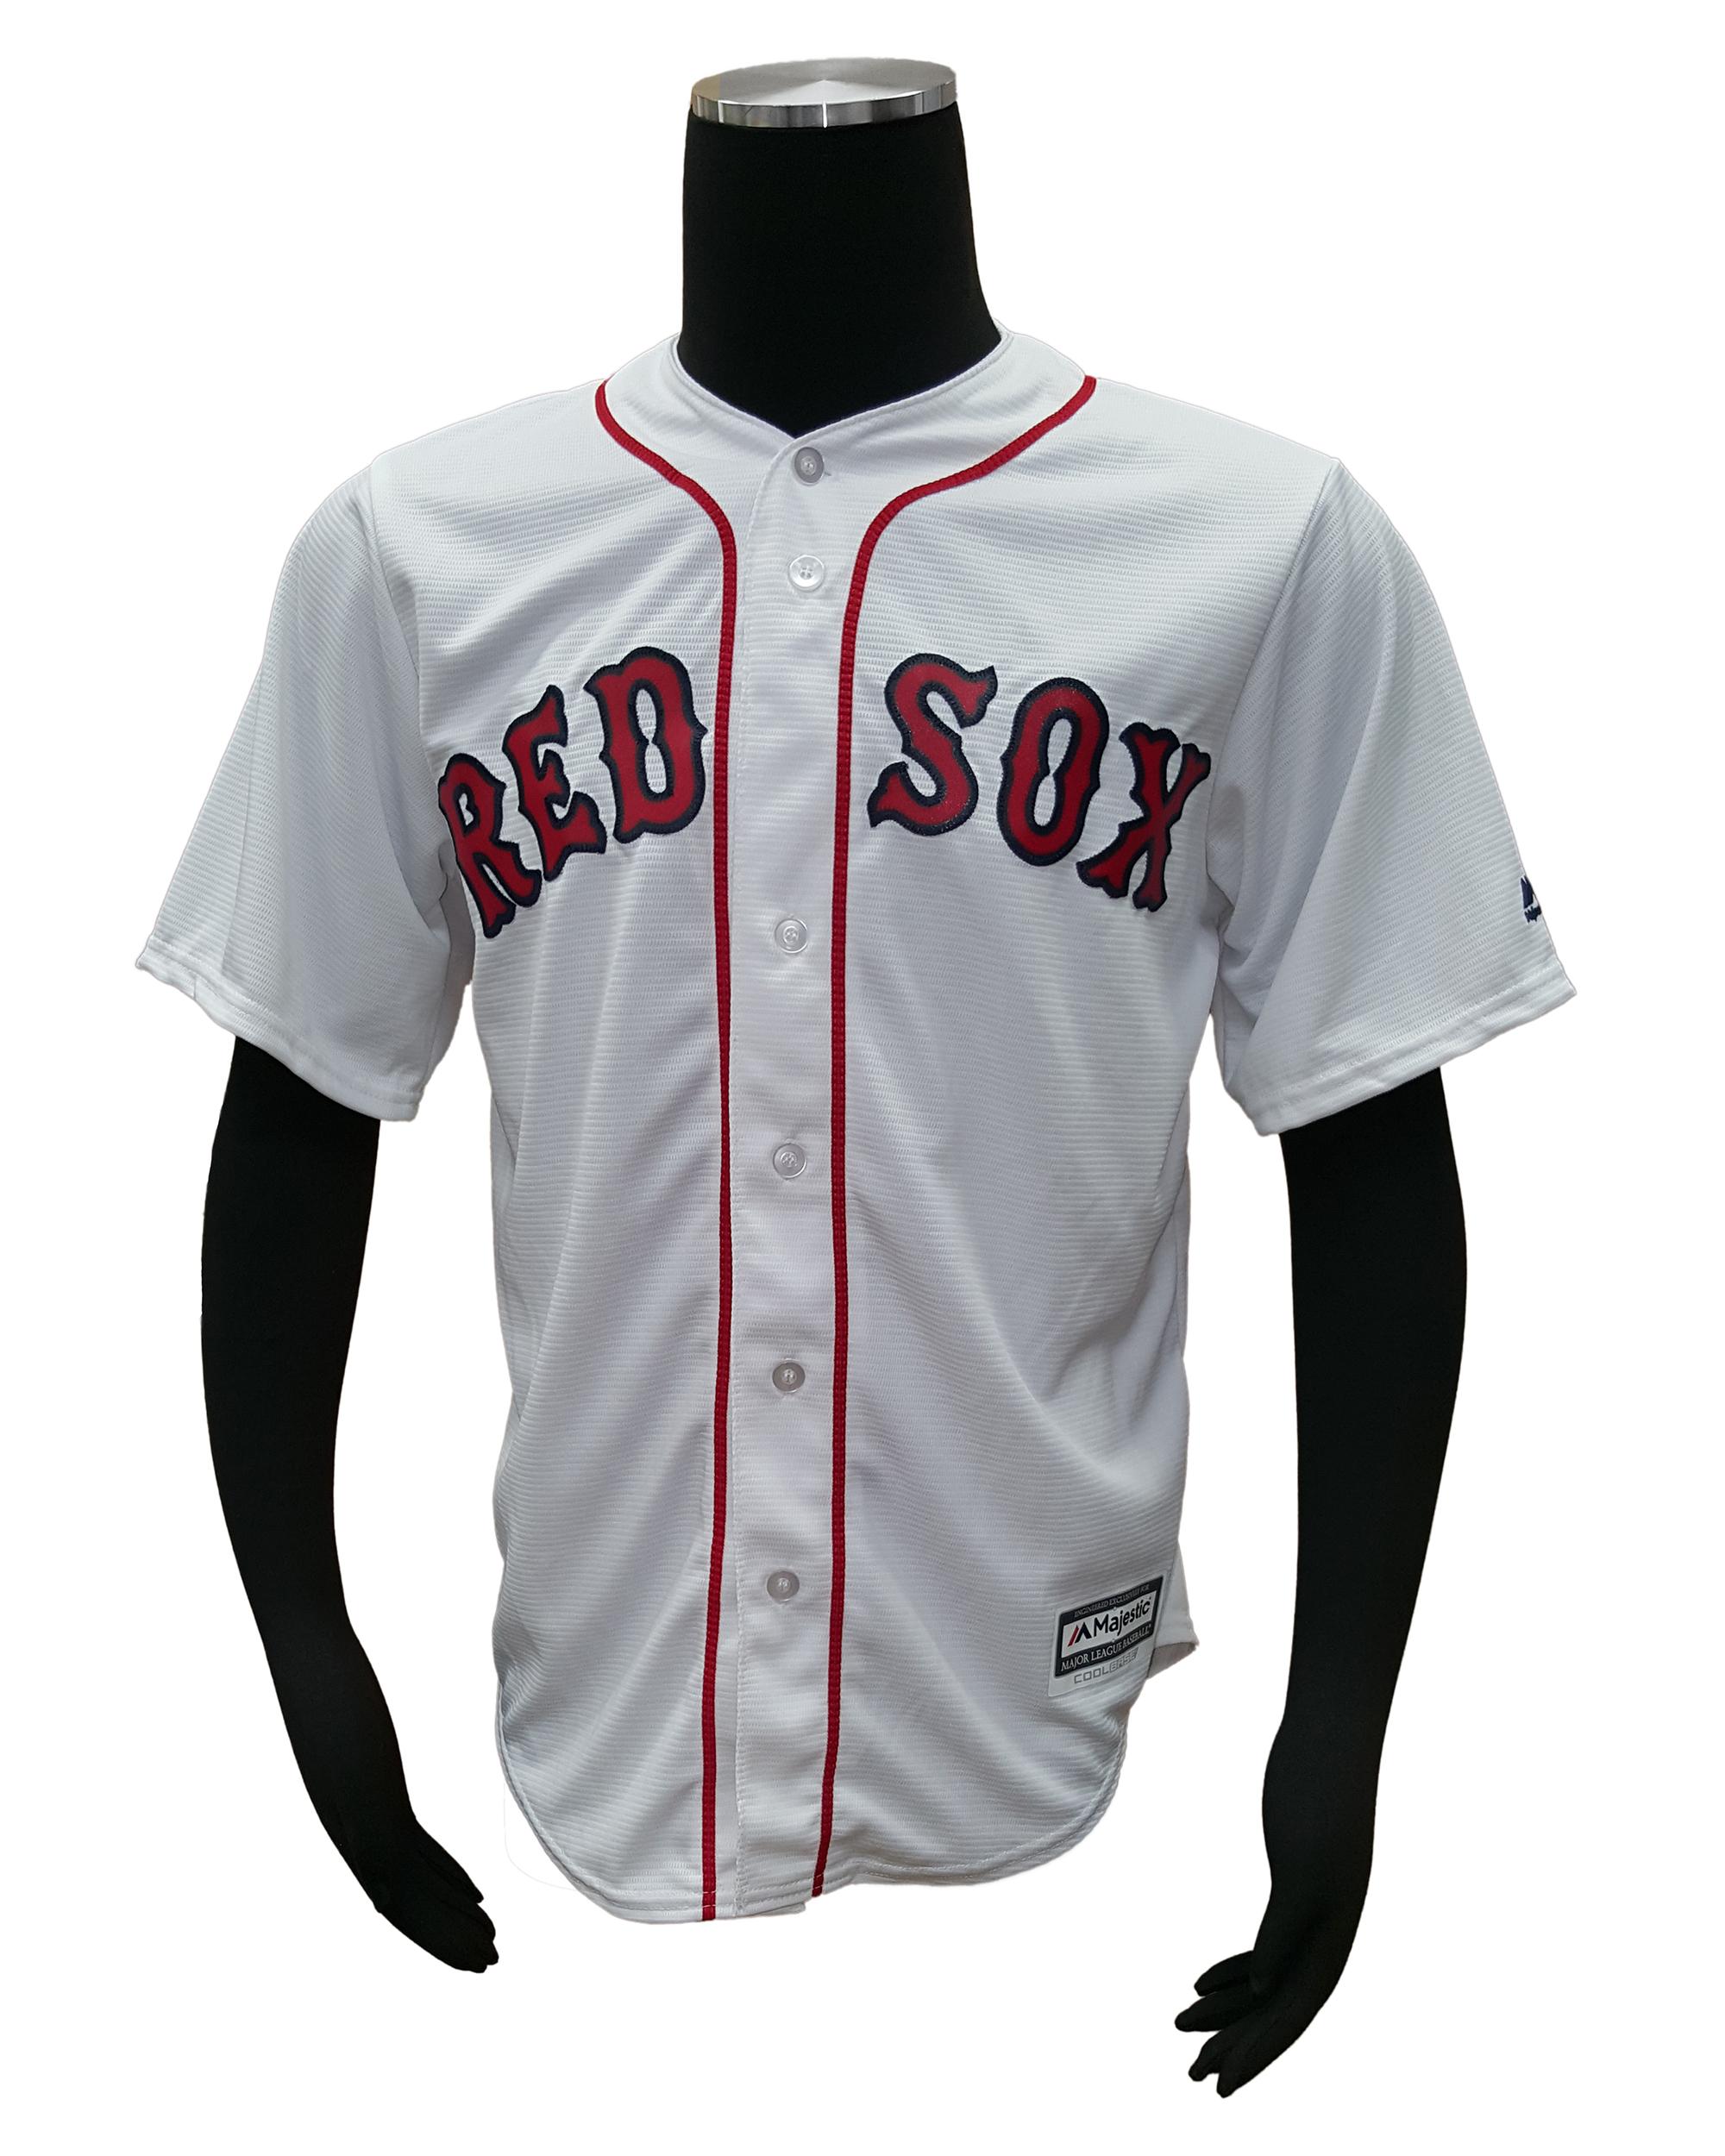 check out 85e5d c75c6 Details about Majestic Men's Replica Alternate Jersey Red Sox Yoenis  Cespedes #52